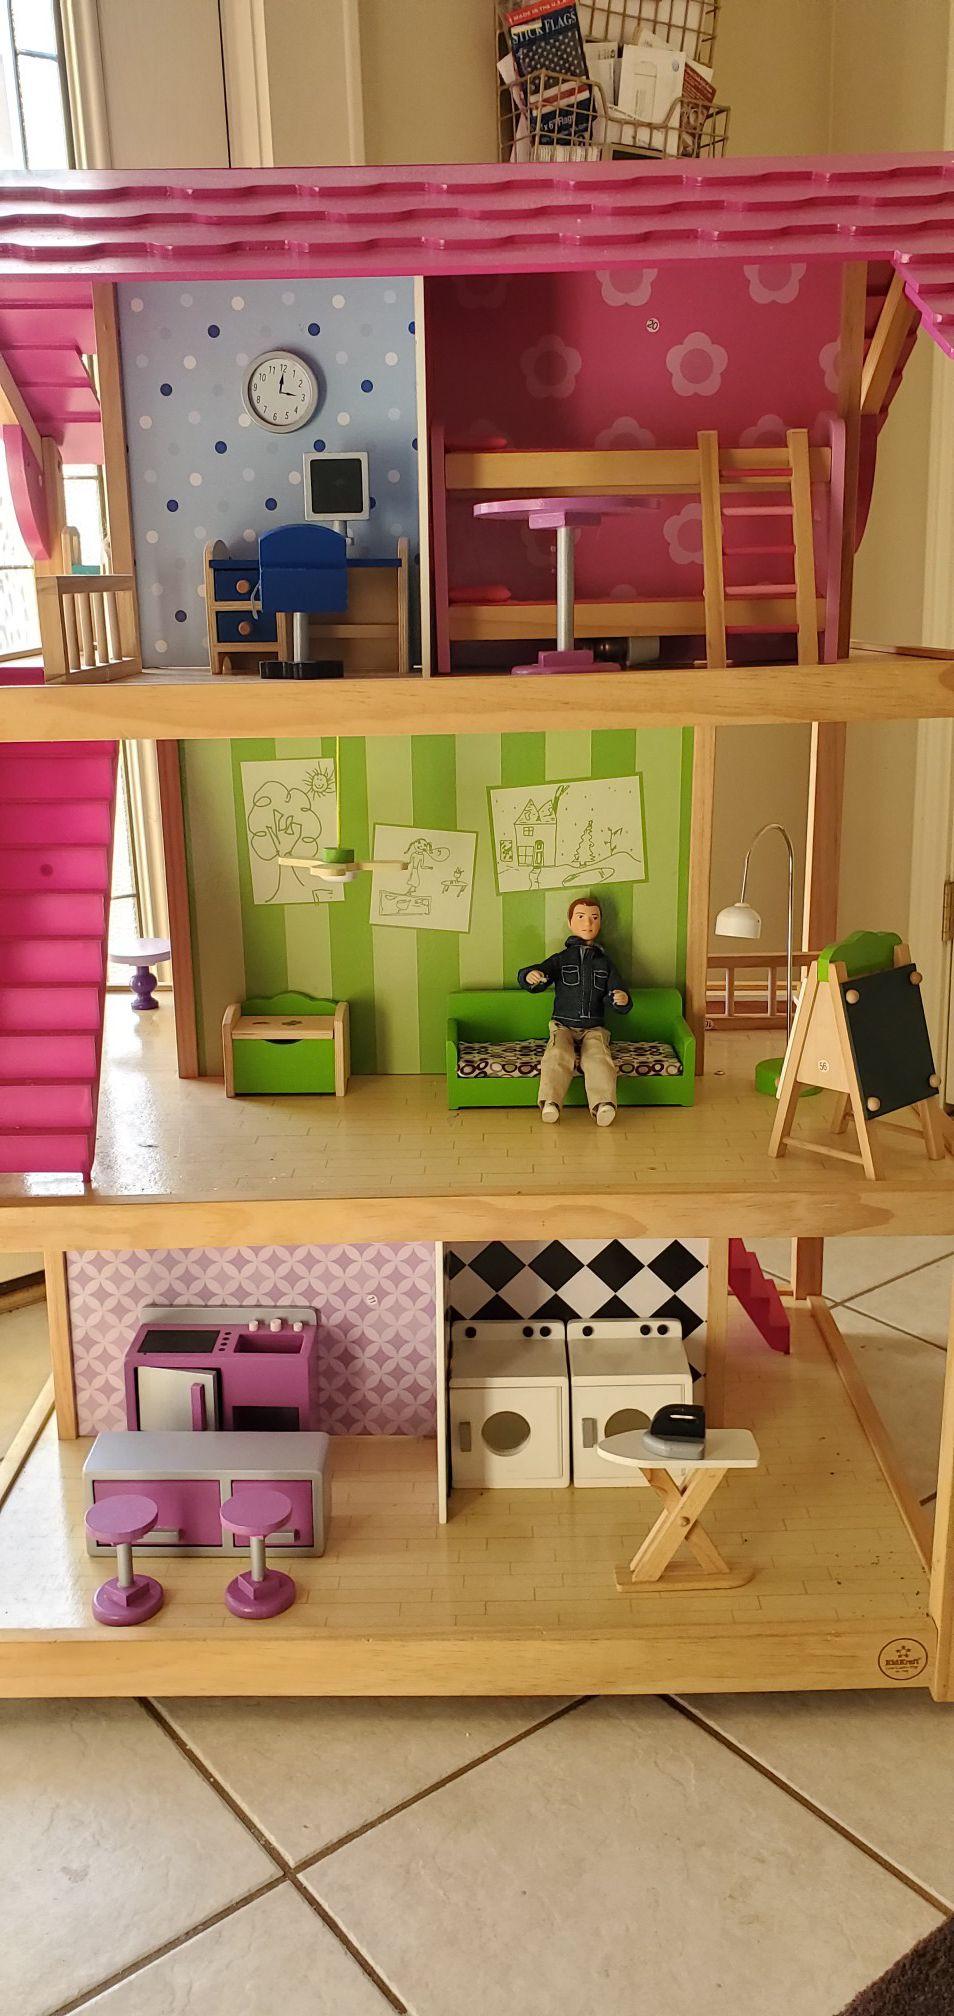 KidKraft Doll House.